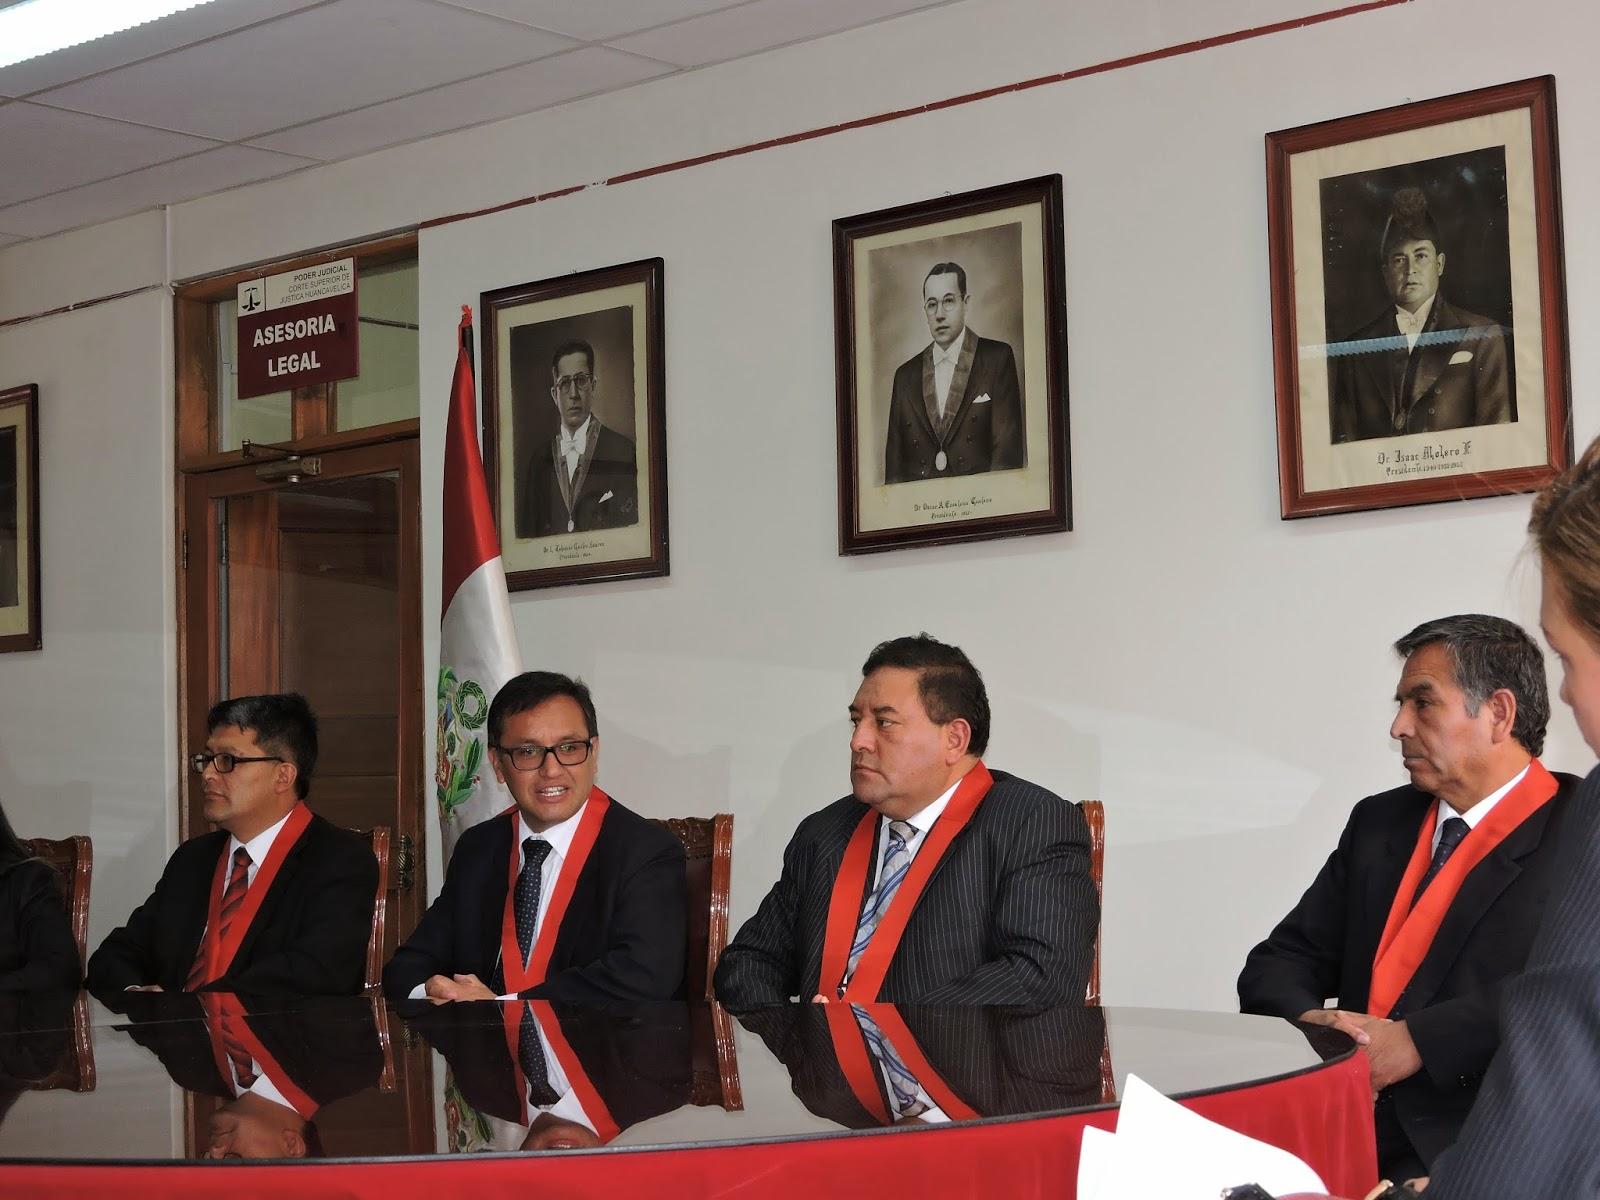 Ueti cpp presidente del eti penal dr bonifacio for Pagina del ministerio de interior y justicia